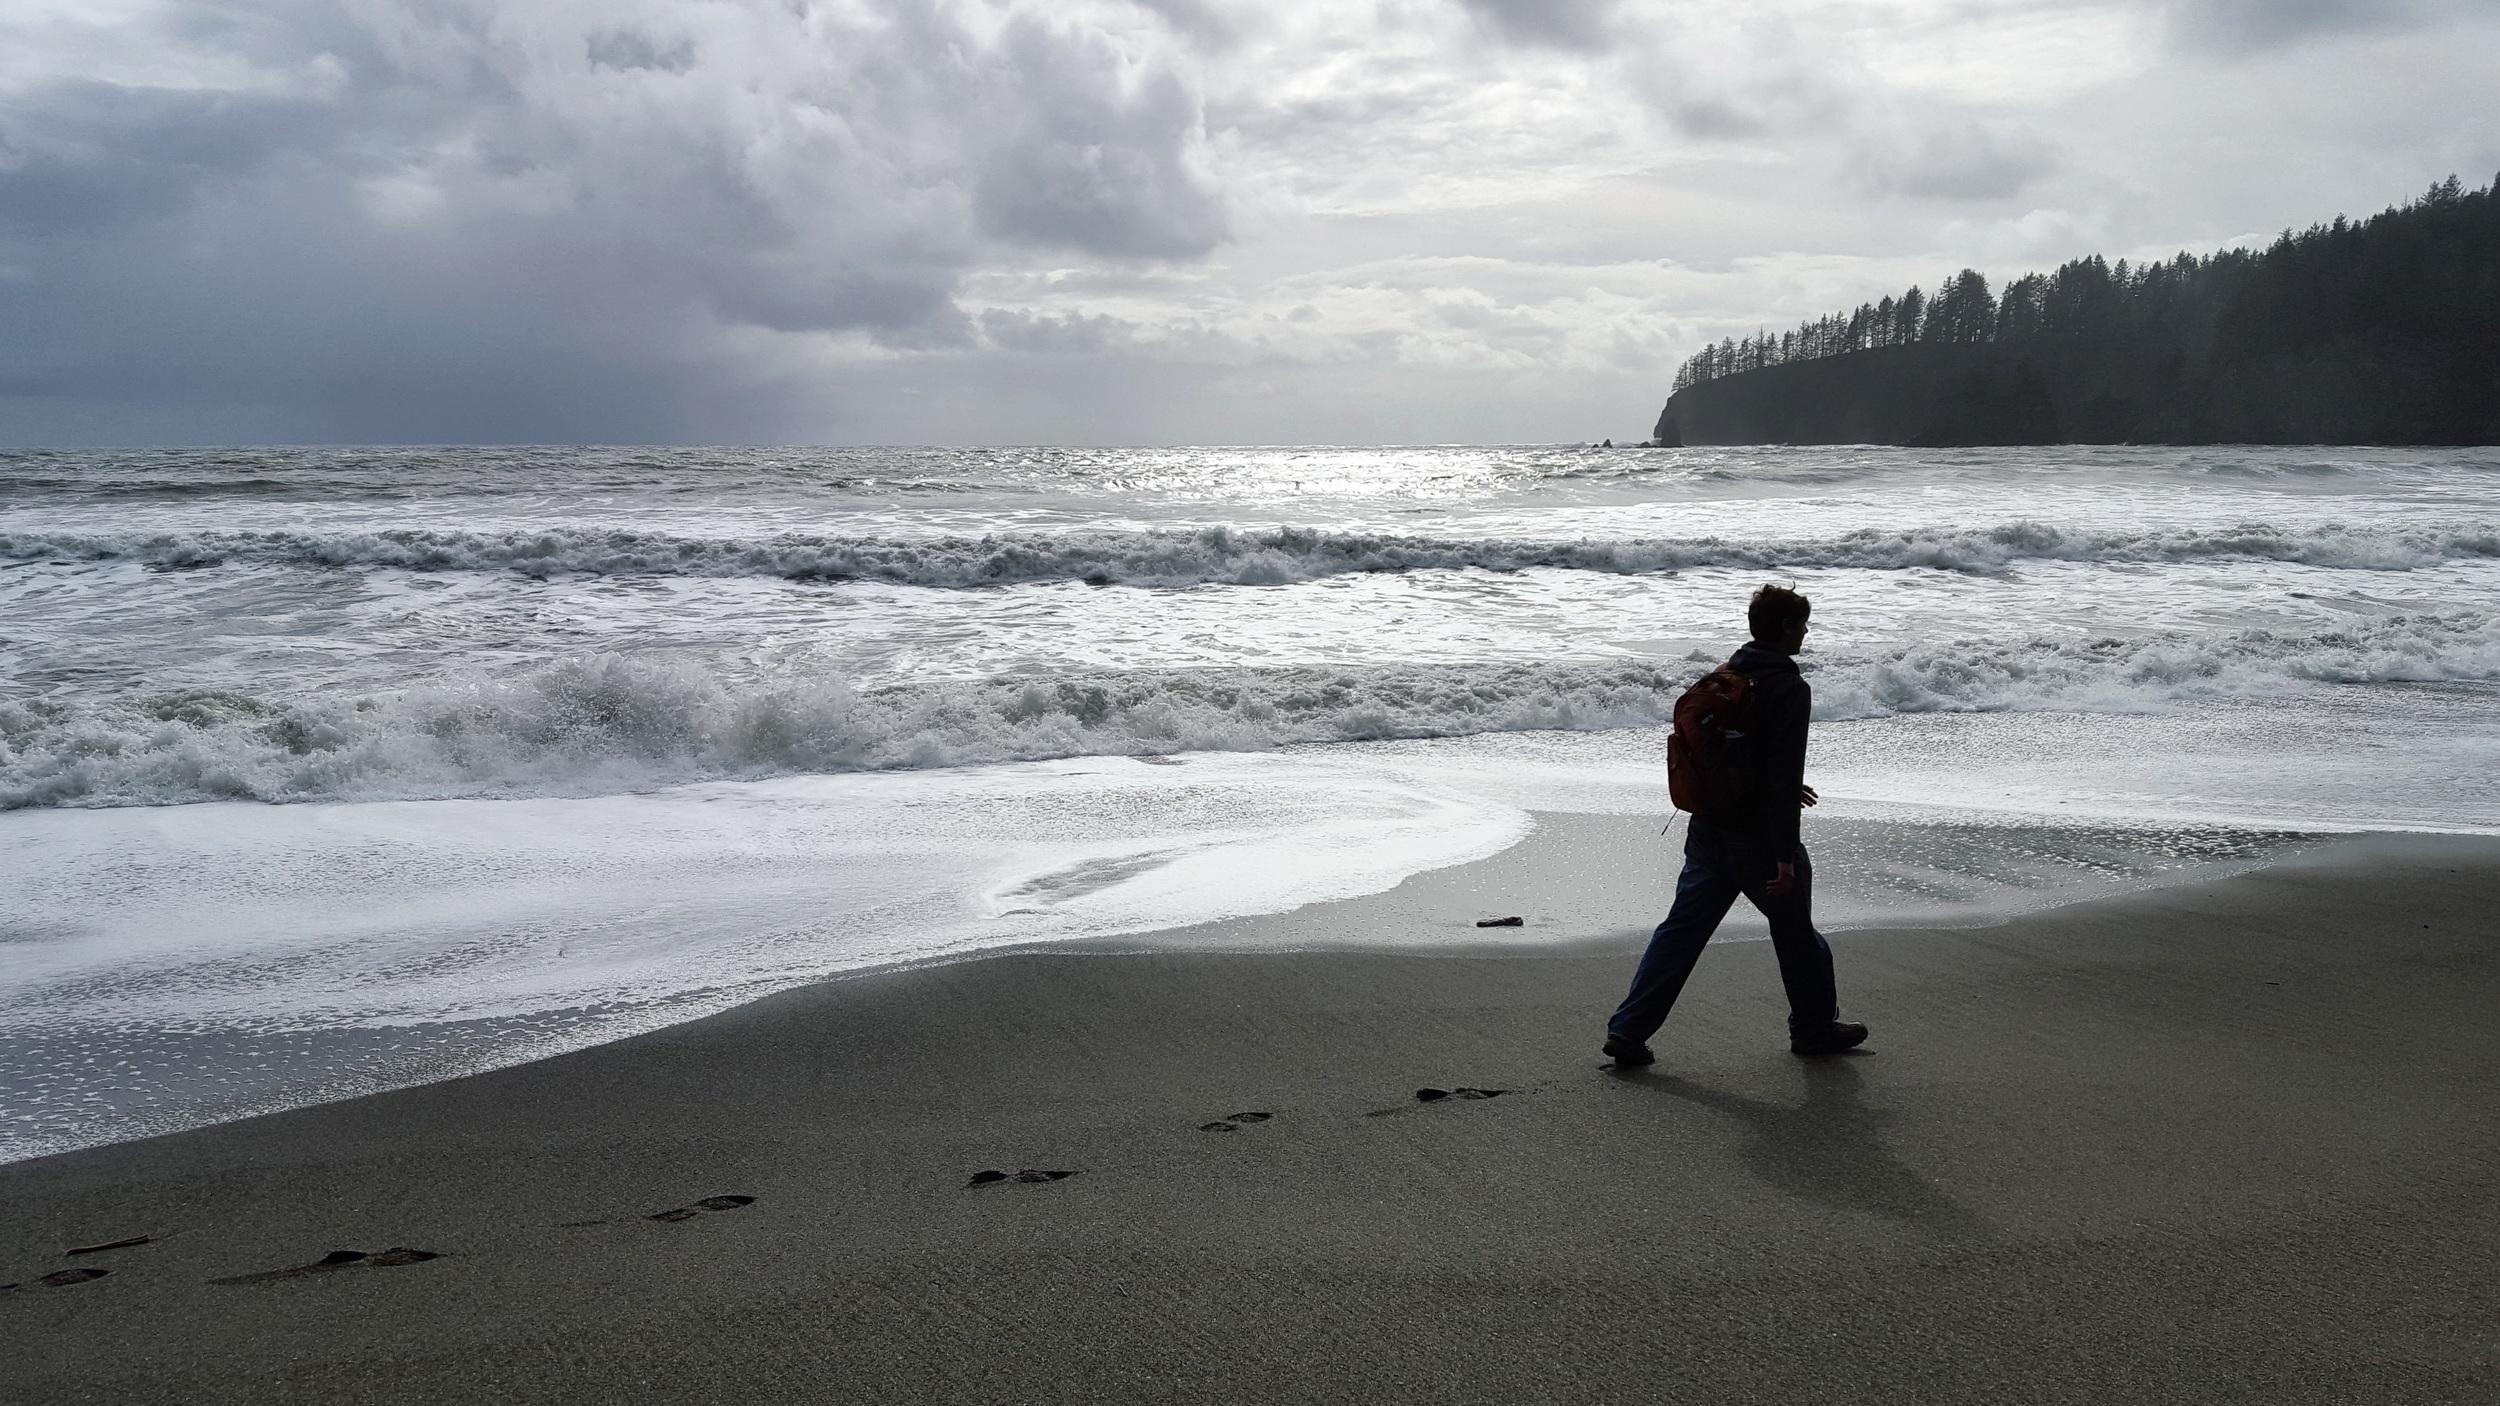 Walking along Third beach on the Washington coast.